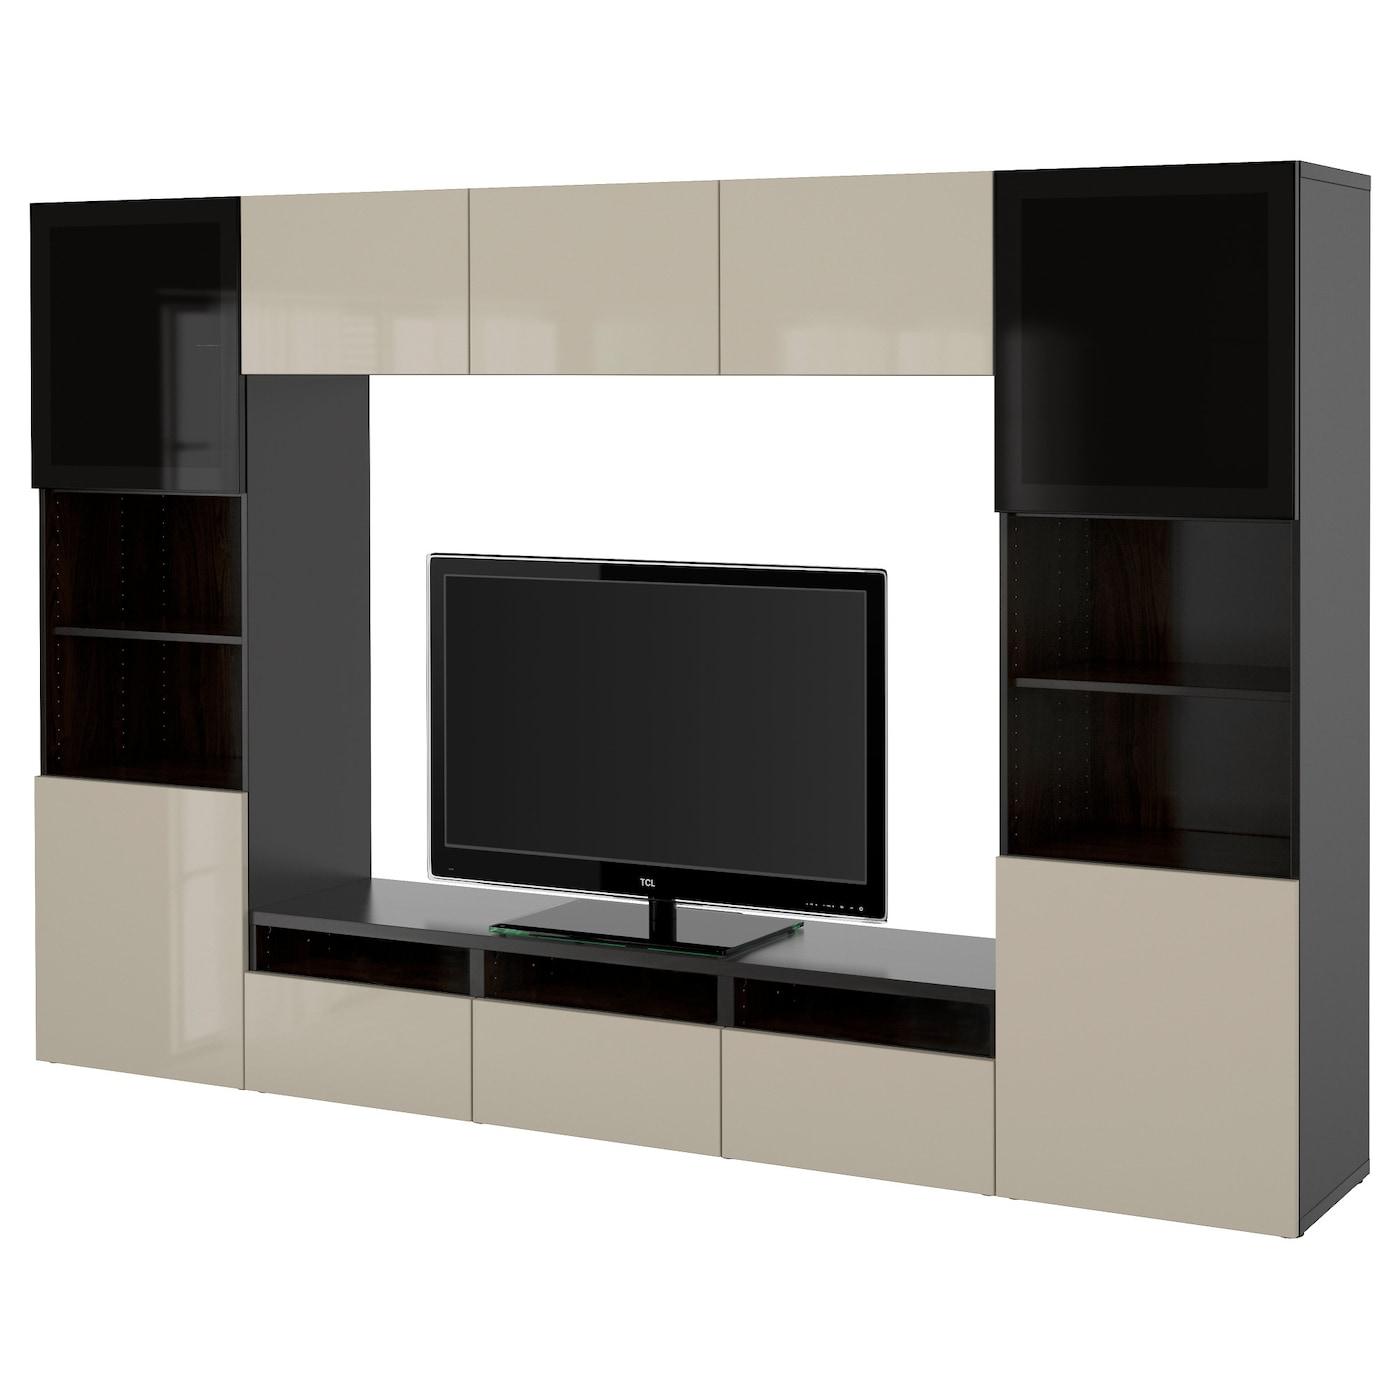 best tv storage combination glass doors black brown selsviken high gloss beige smoked glass. Black Bedroom Furniture Sets. Home Design Ideas